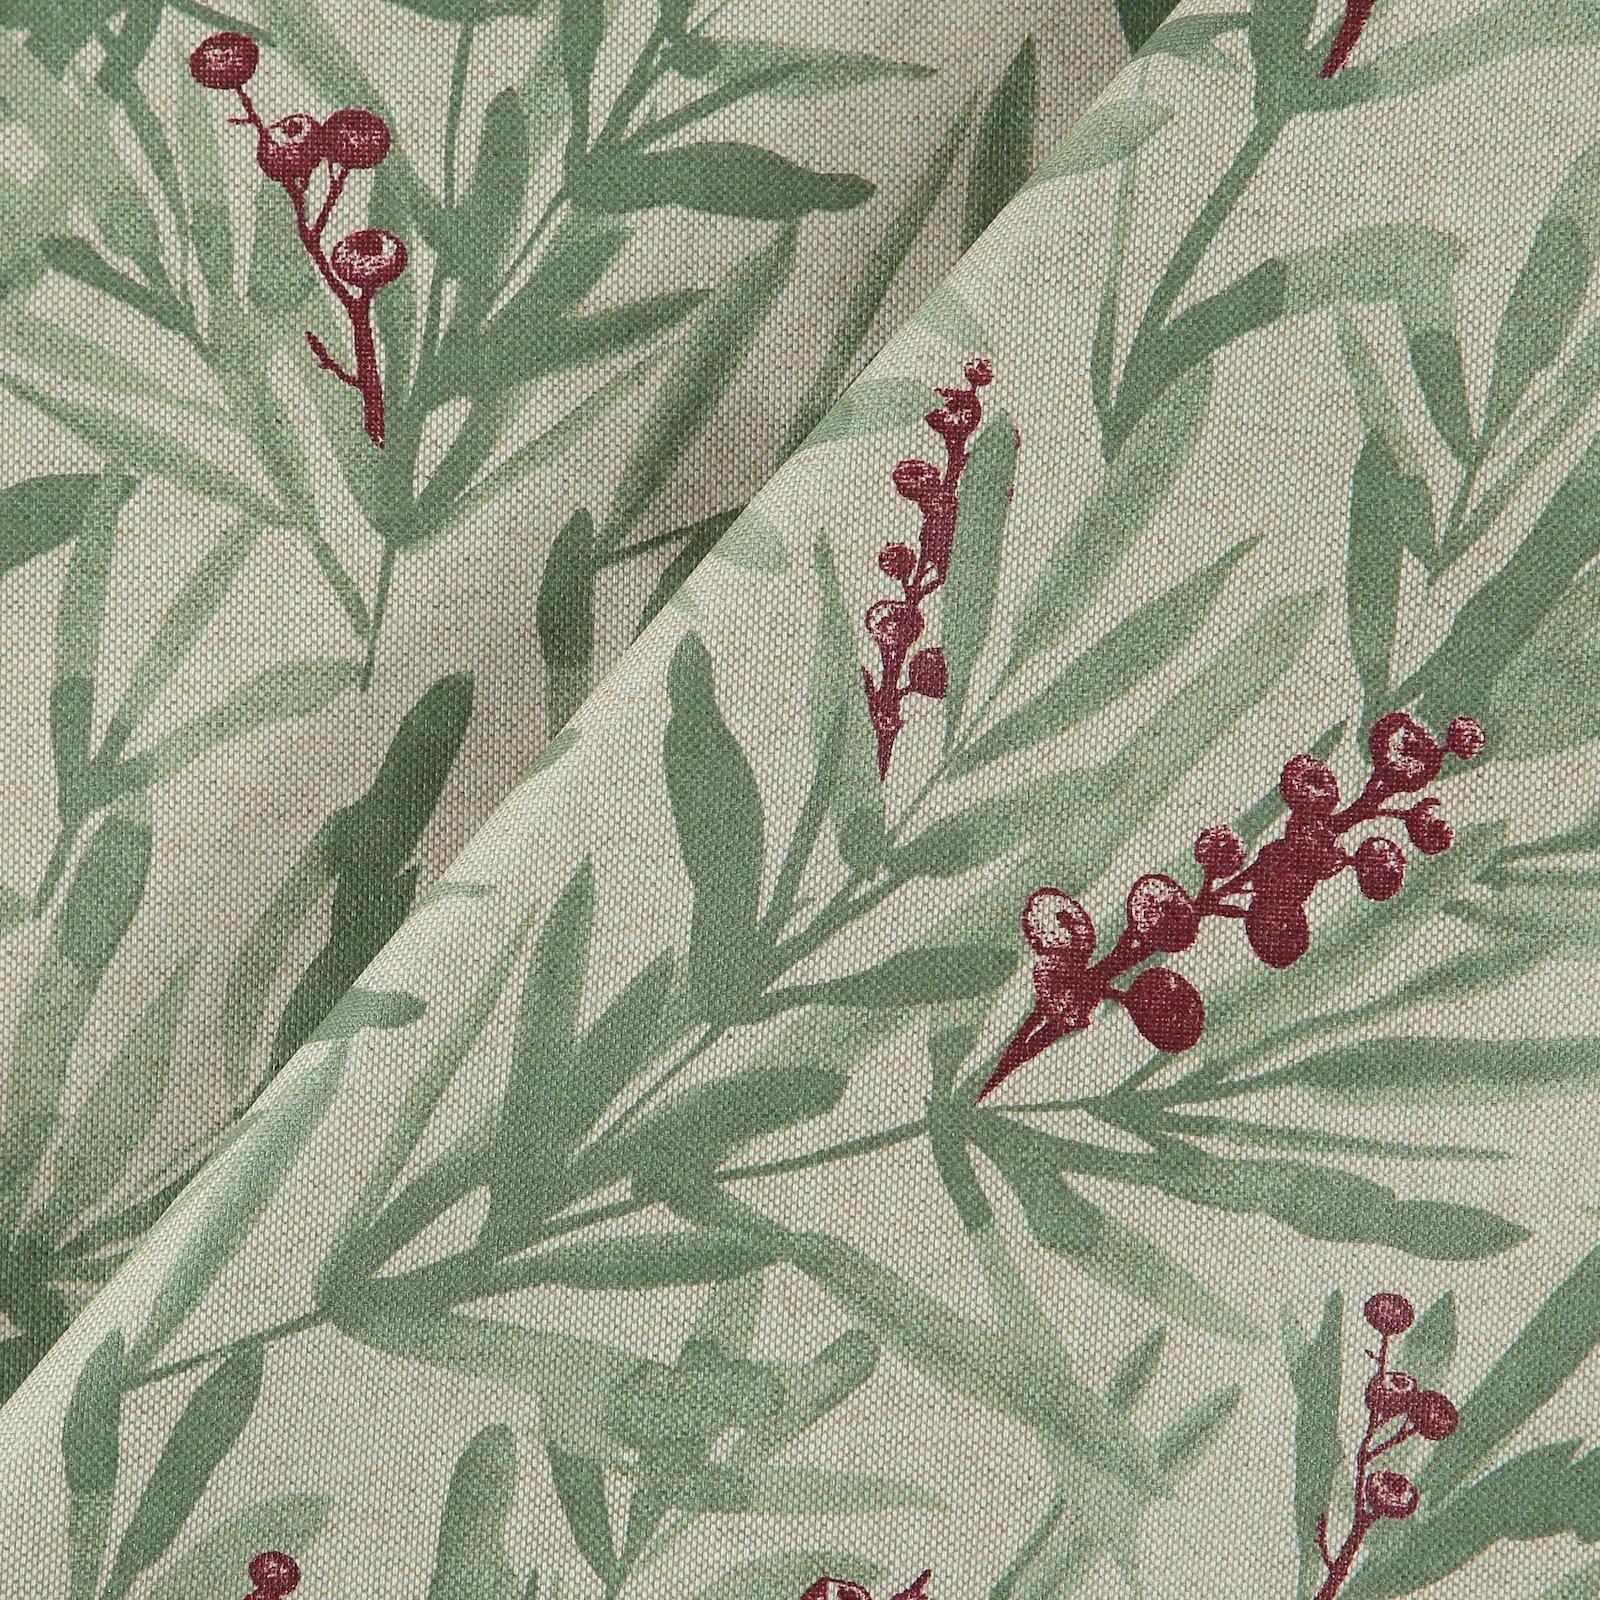 Woven oilcloth linenlook w berries 872308_pack